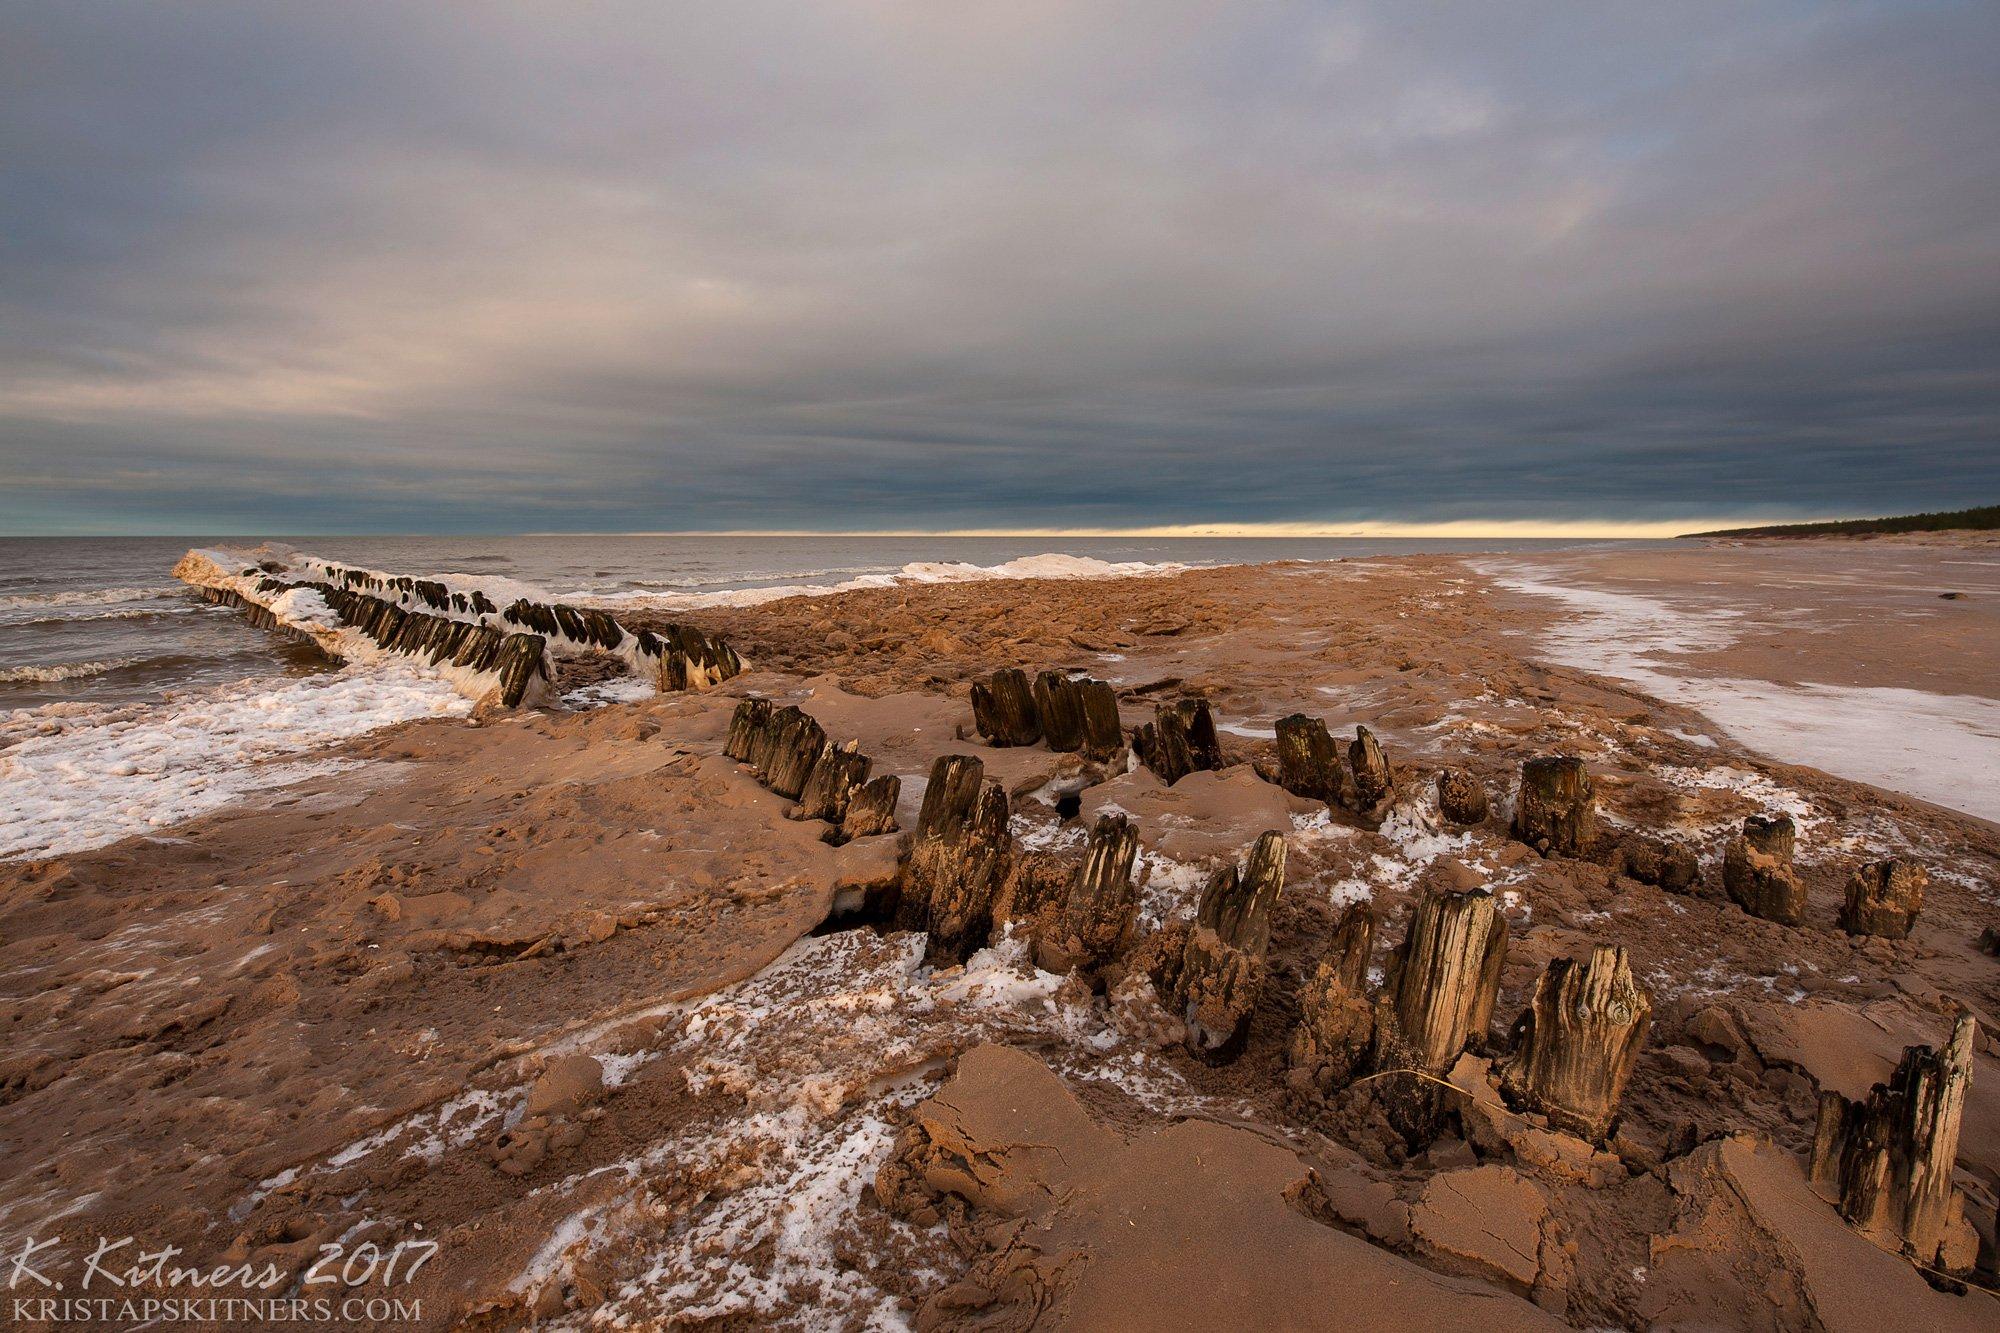 sea seascape ice snow winter sky clouds pier evening latvia, Kristaps Kitners